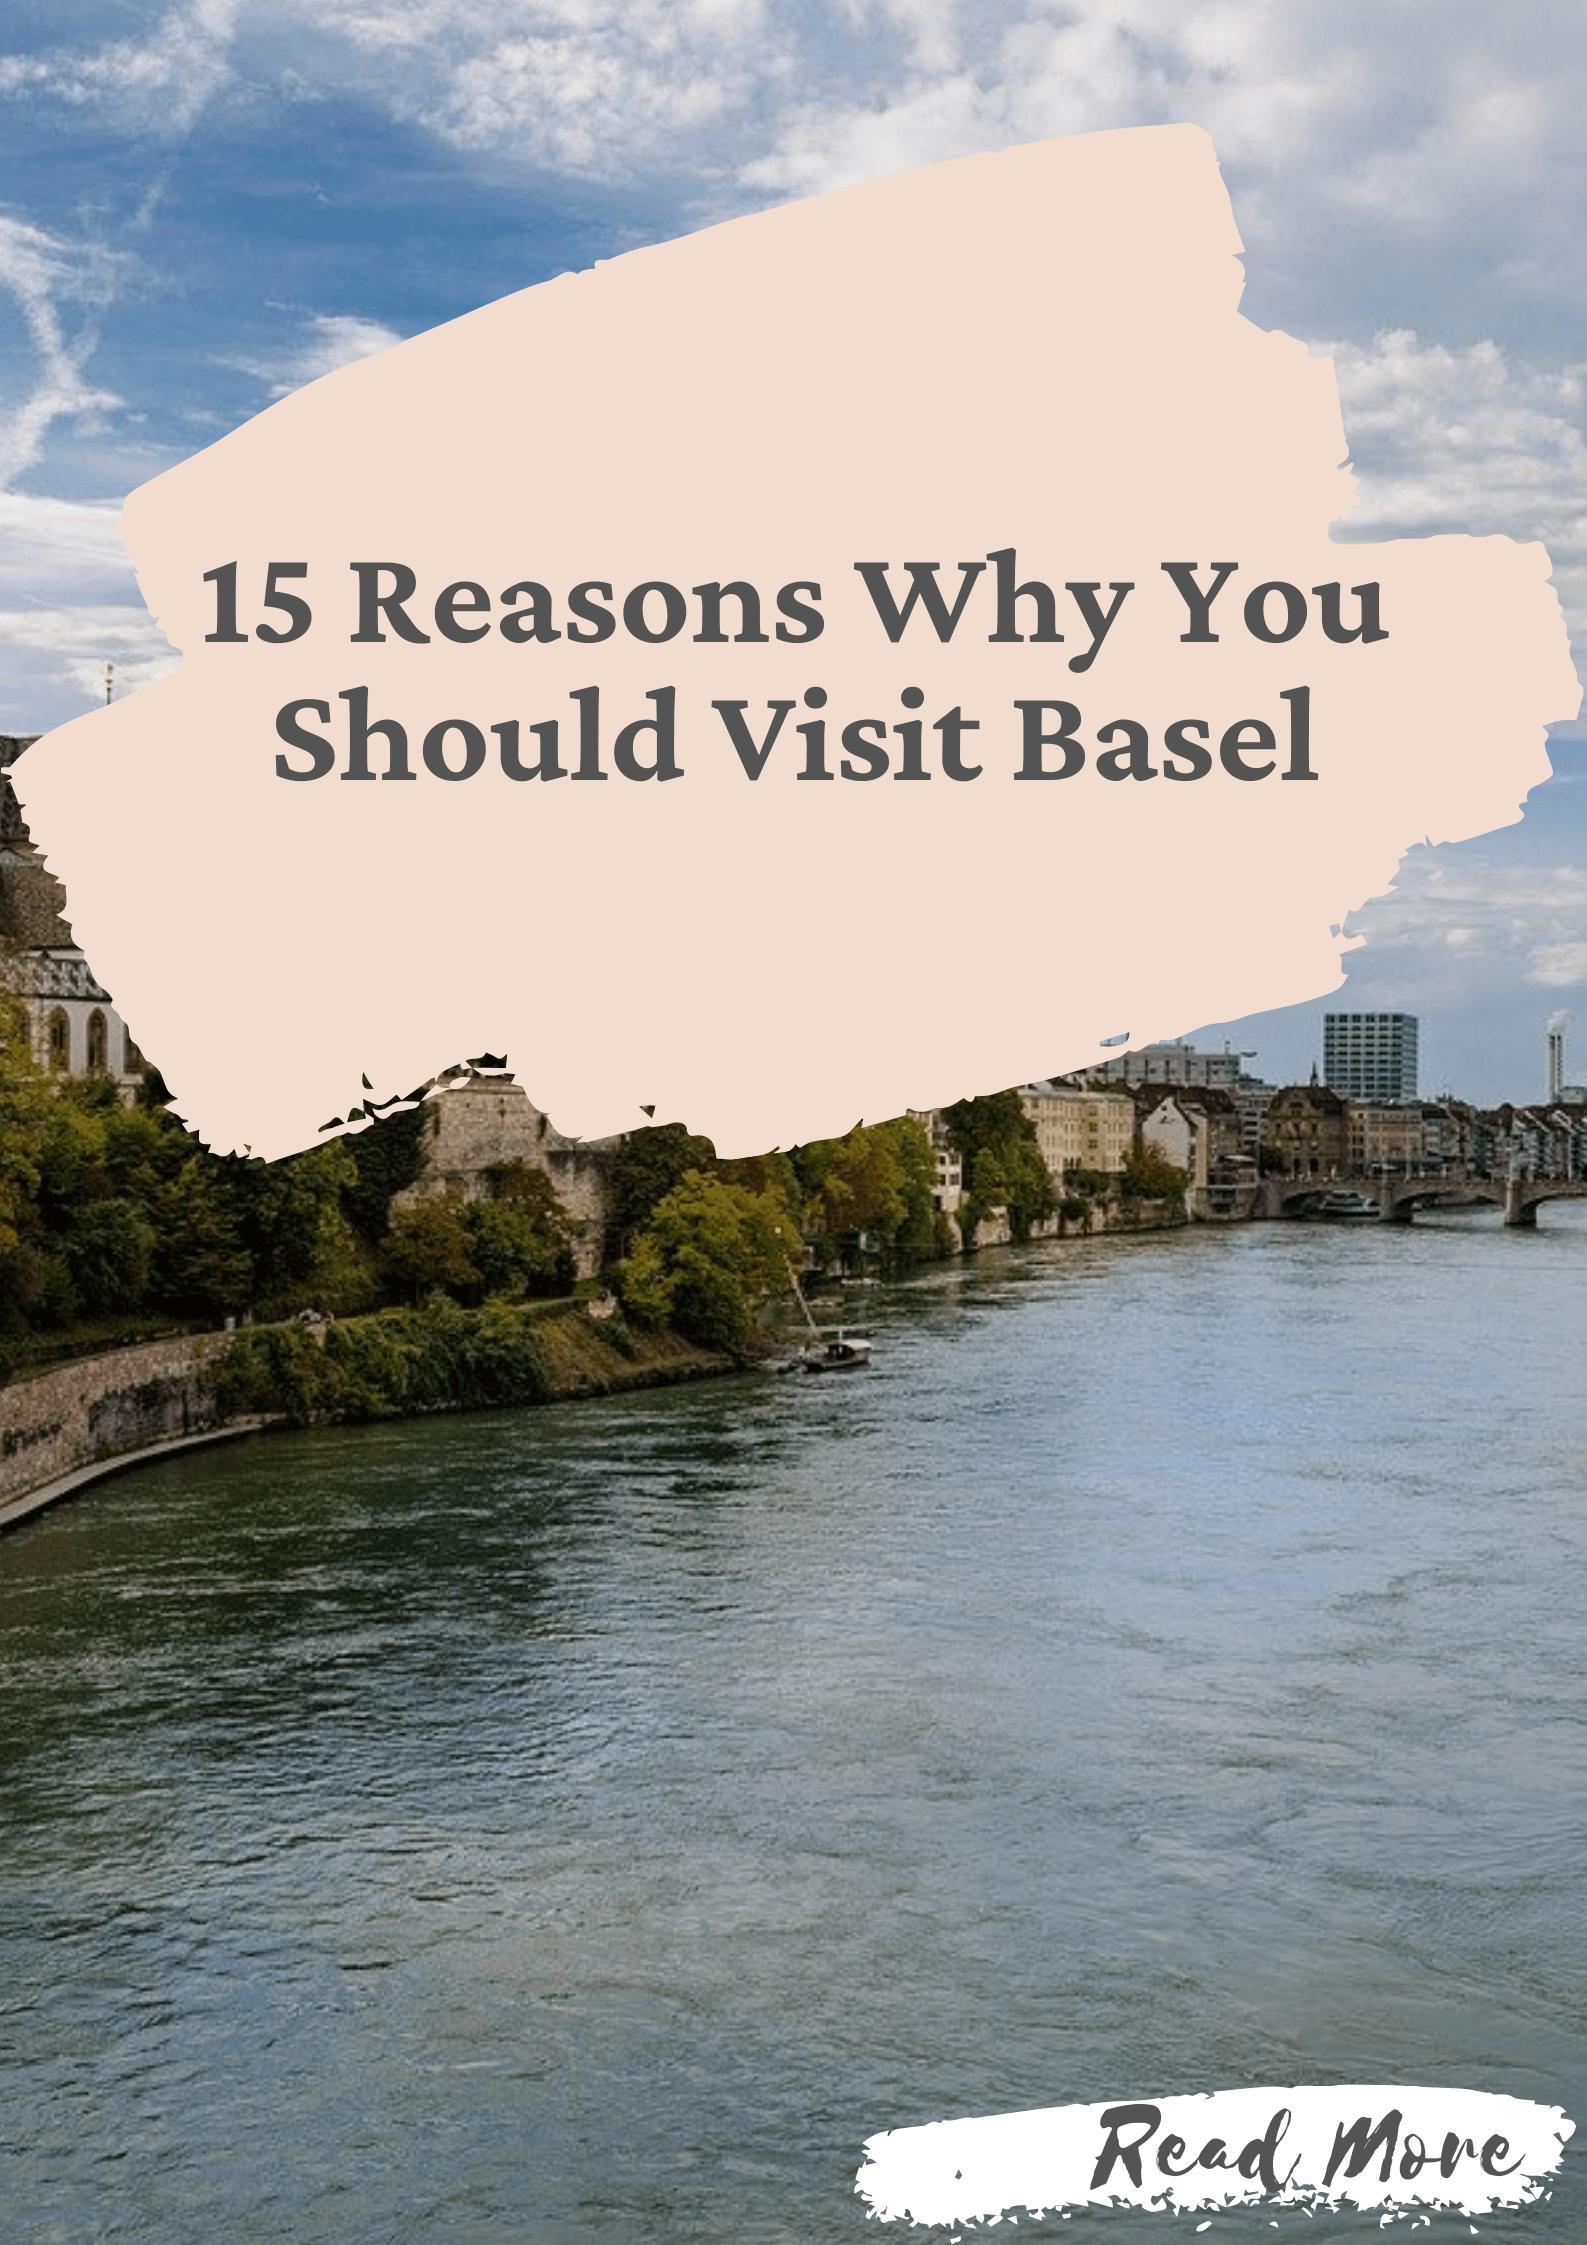 15 Reasons Why You Should Visit Basel